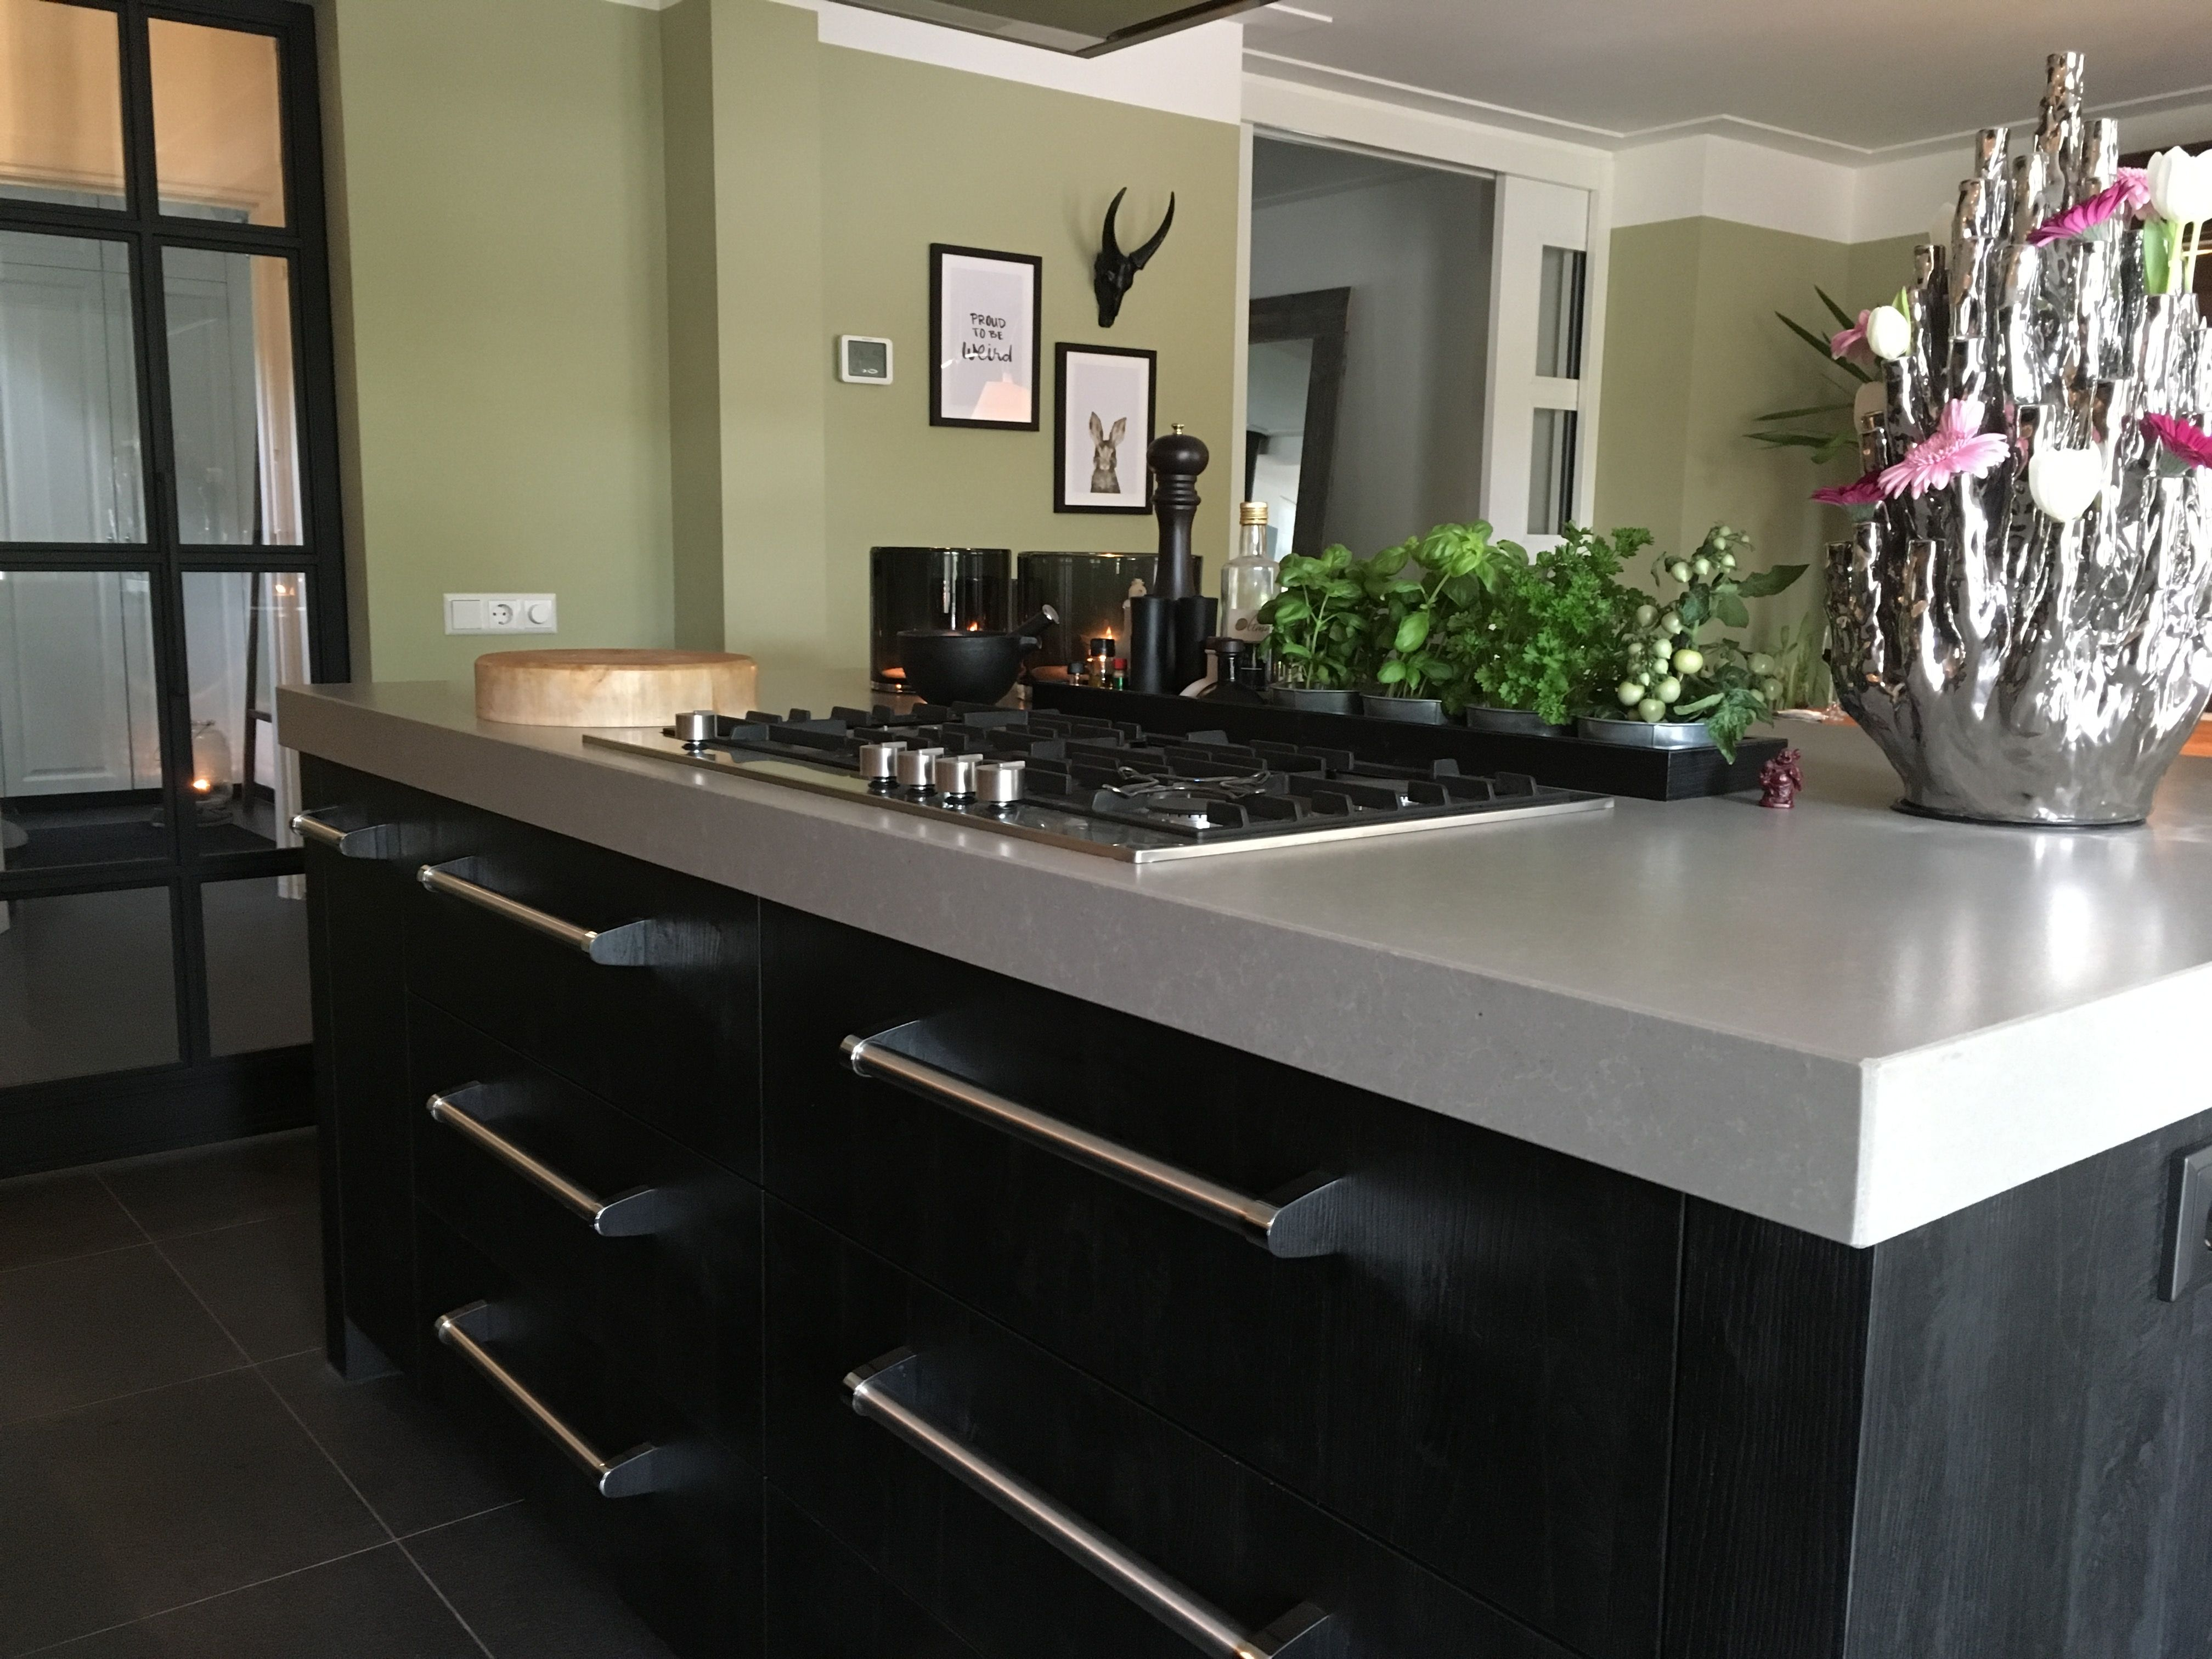 Boretti Keuken Galerij : Handgemaakte pinter zwarte handgrepen keuken babyfoot